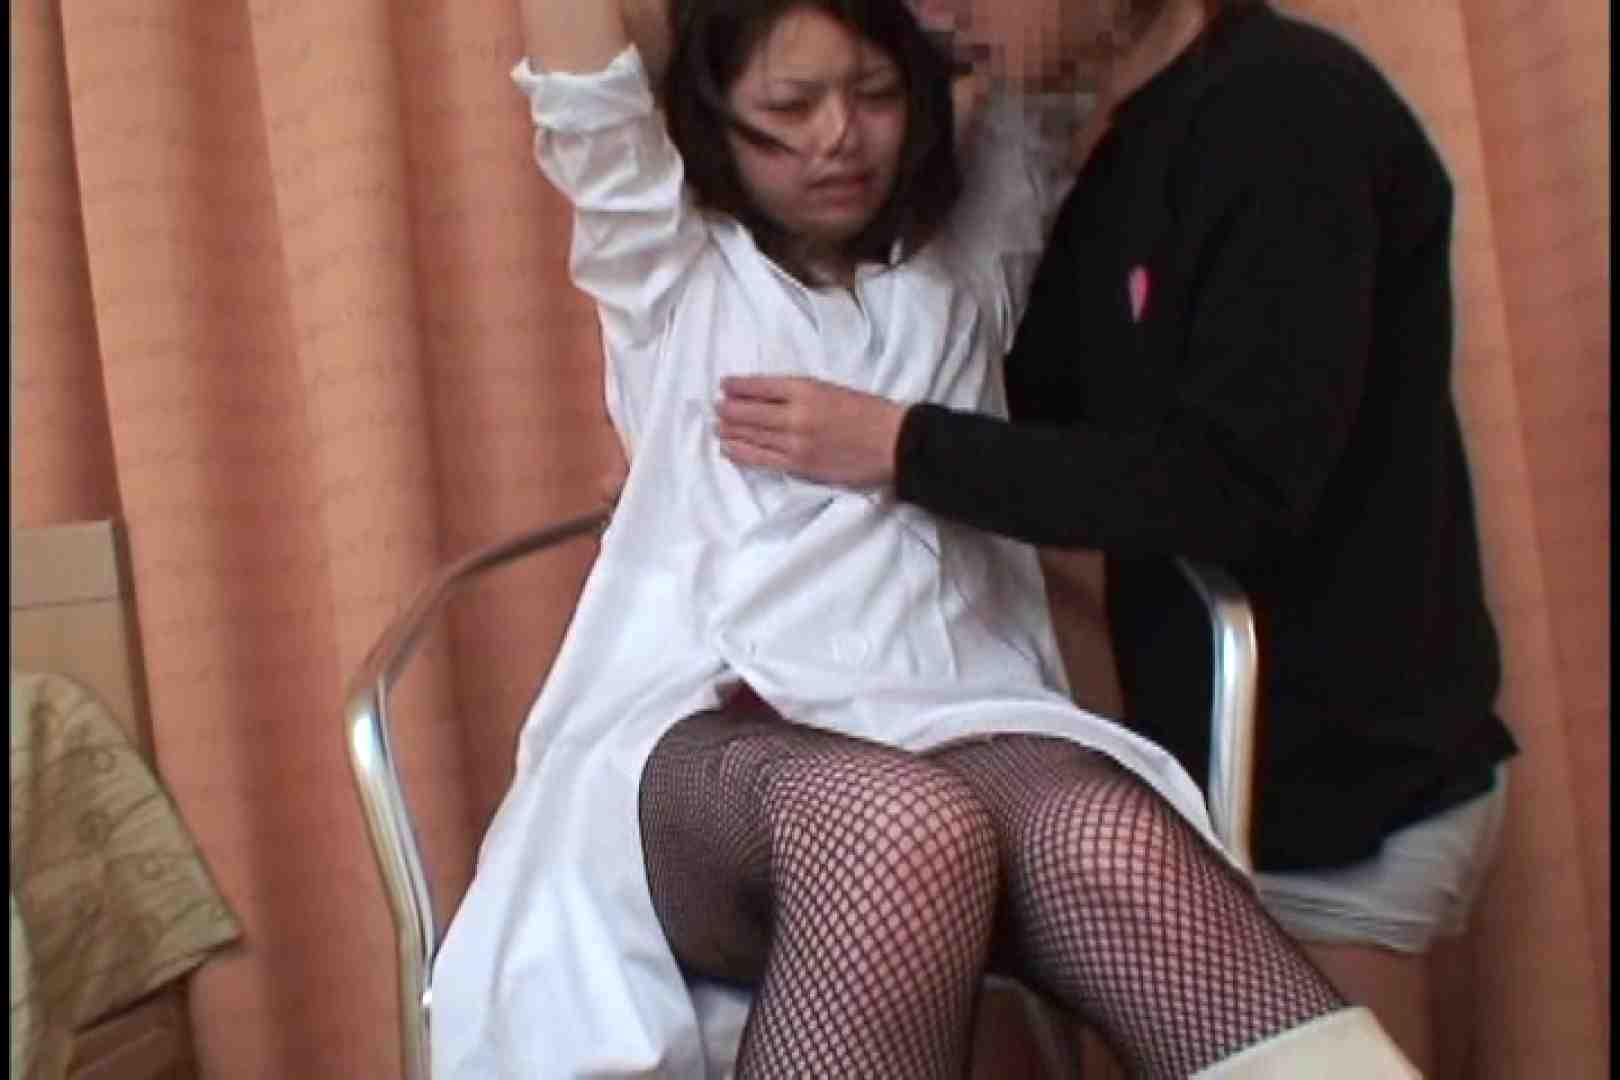 JDハンター全国ツアー vol.011 後編 女子大生丸裸  76pic 32